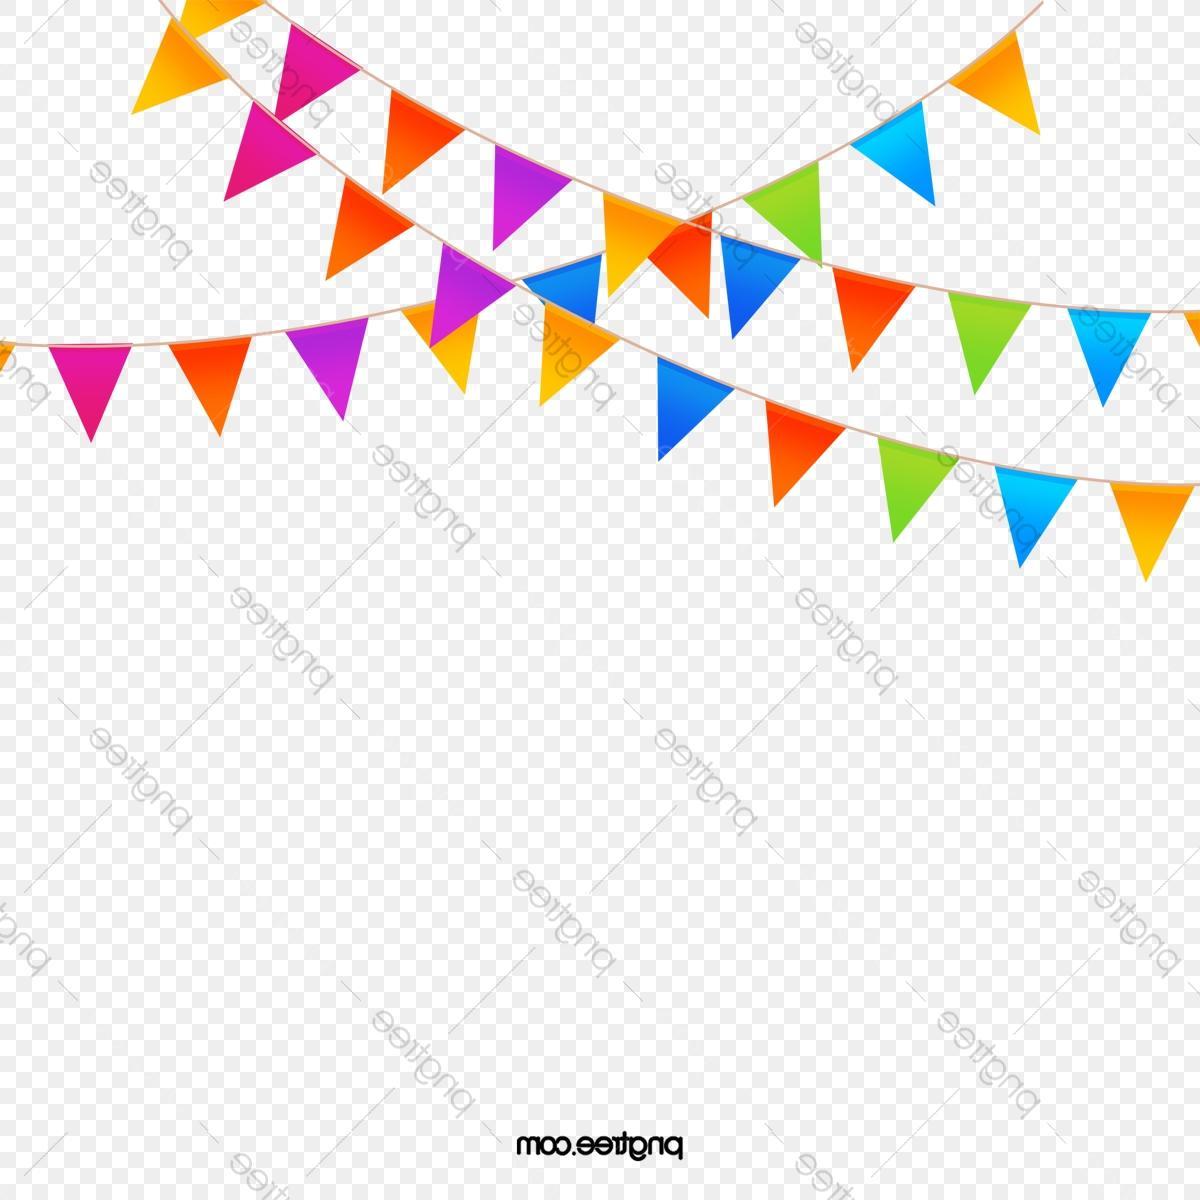 Top triangle clip art. Triangular clipart banner